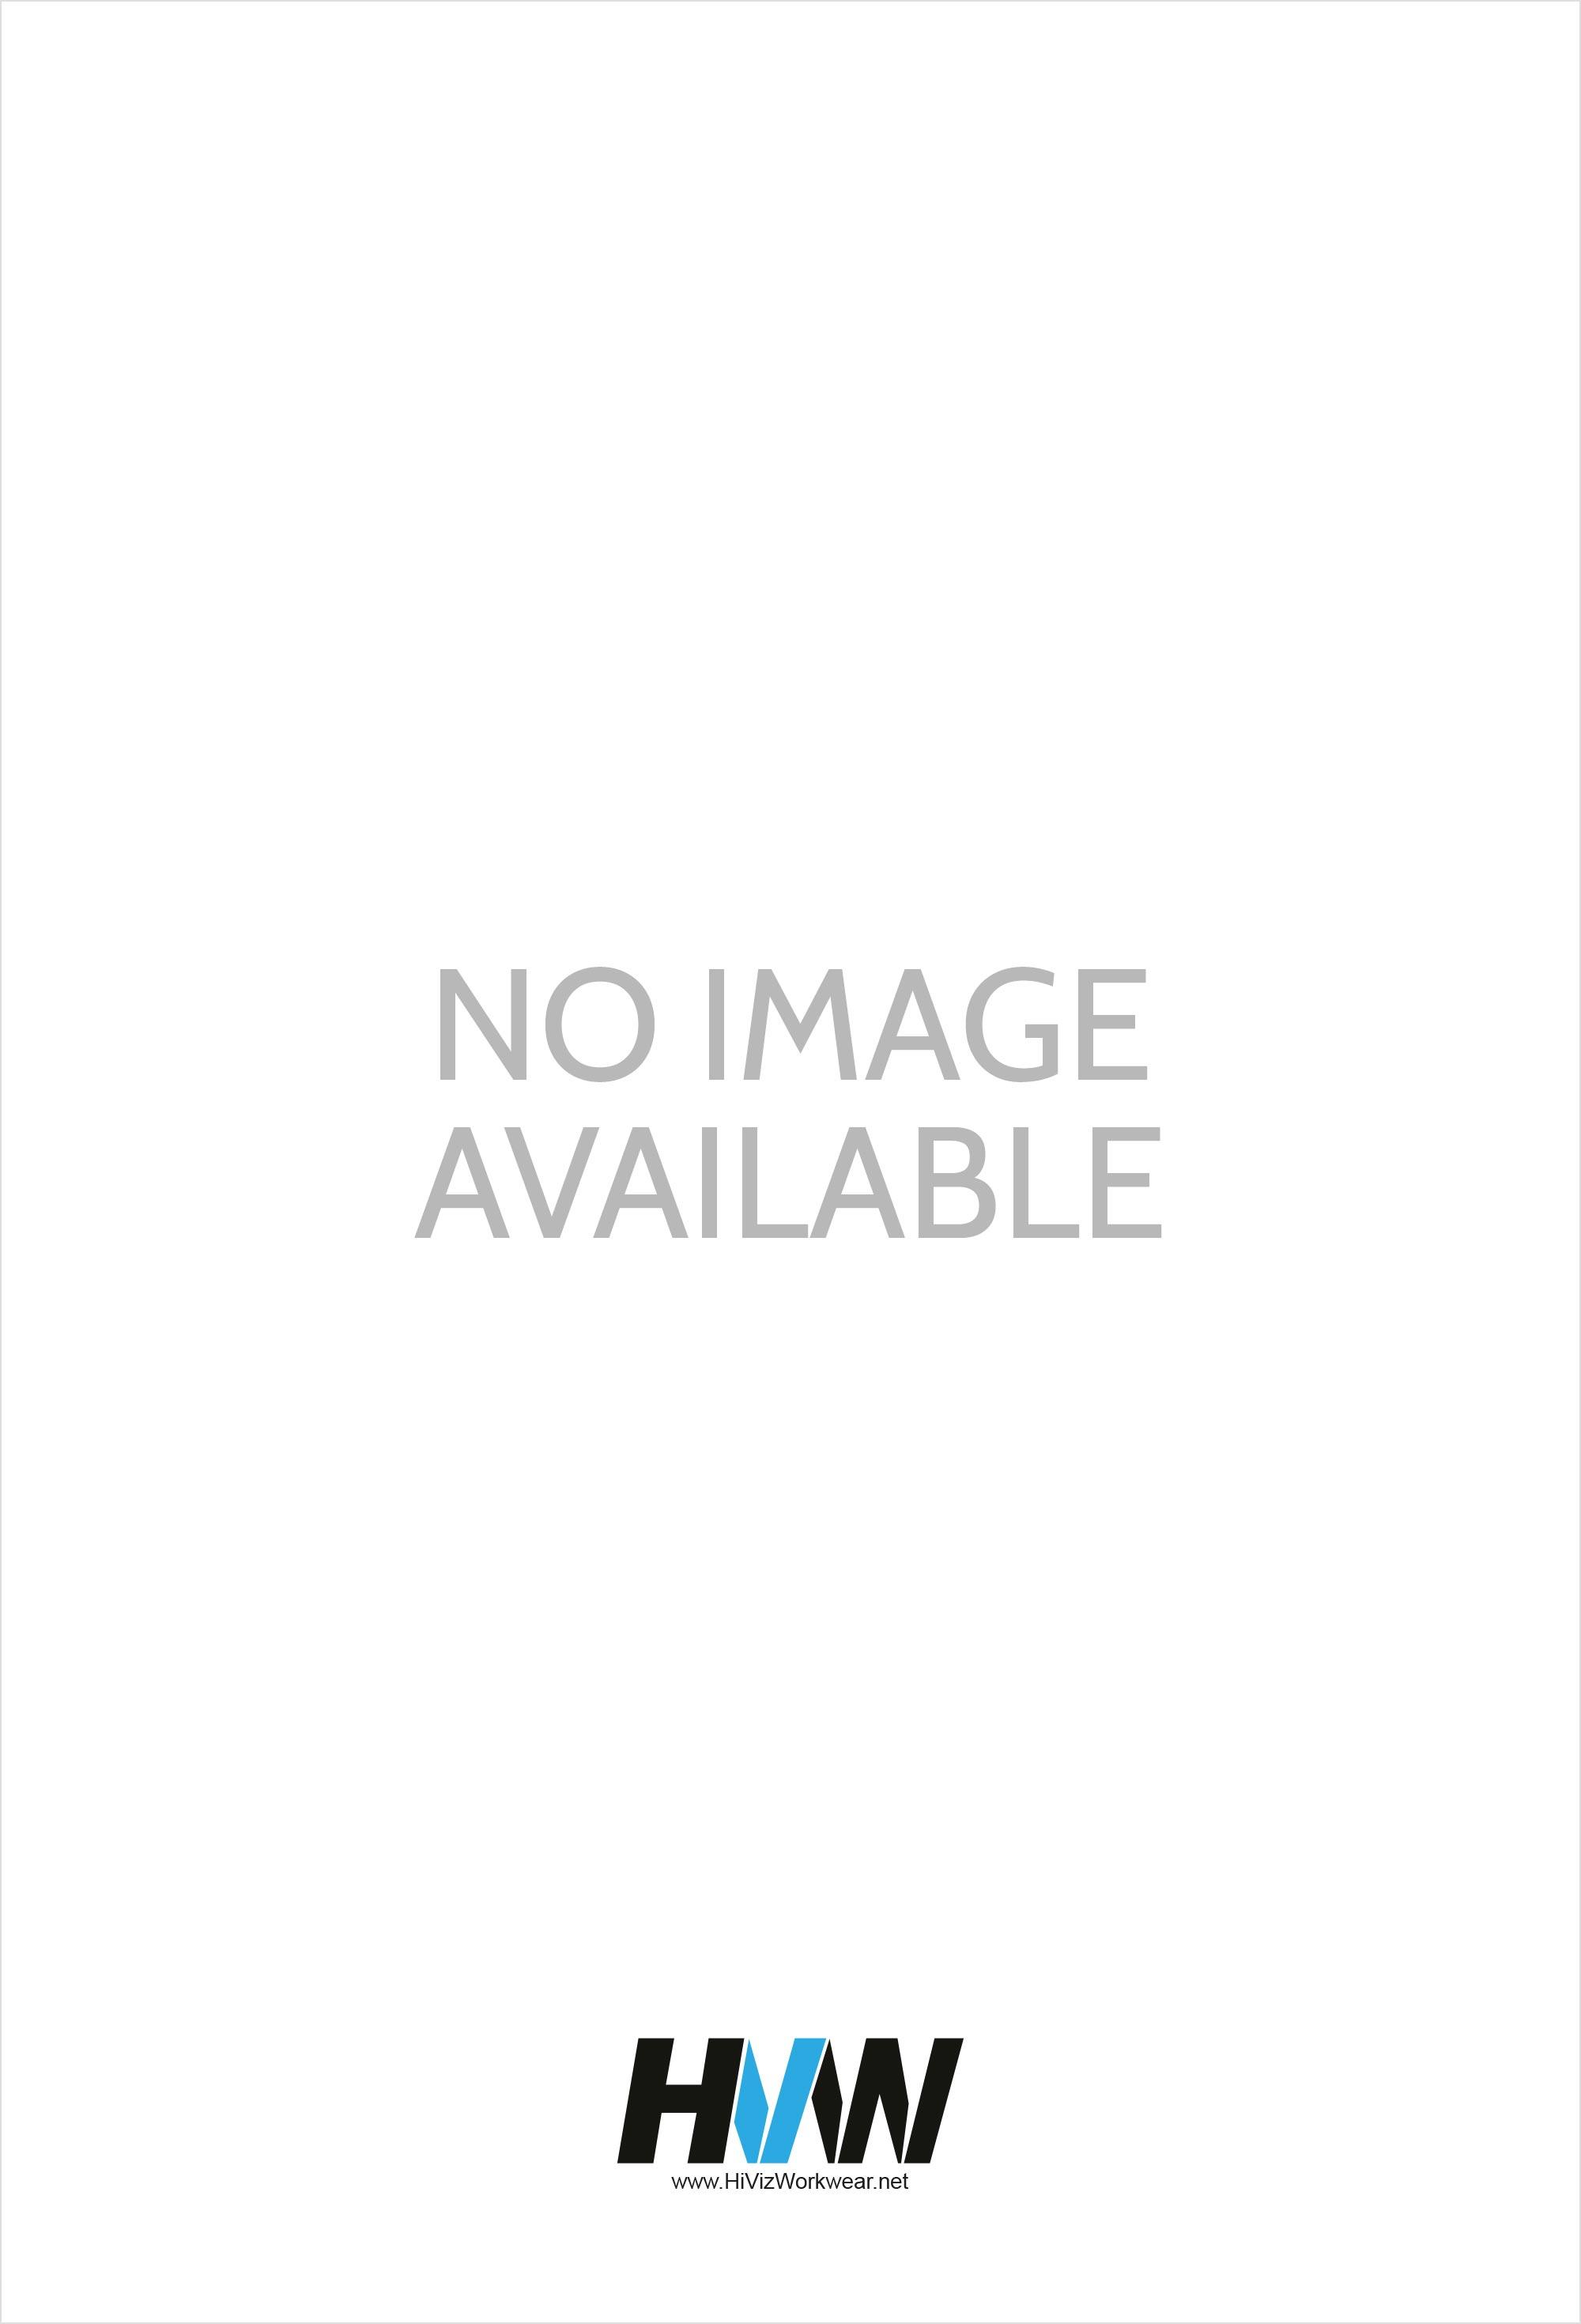 Kustom Kit KK100 Workforce Short Sleeve Shirt  (S To 3XL)